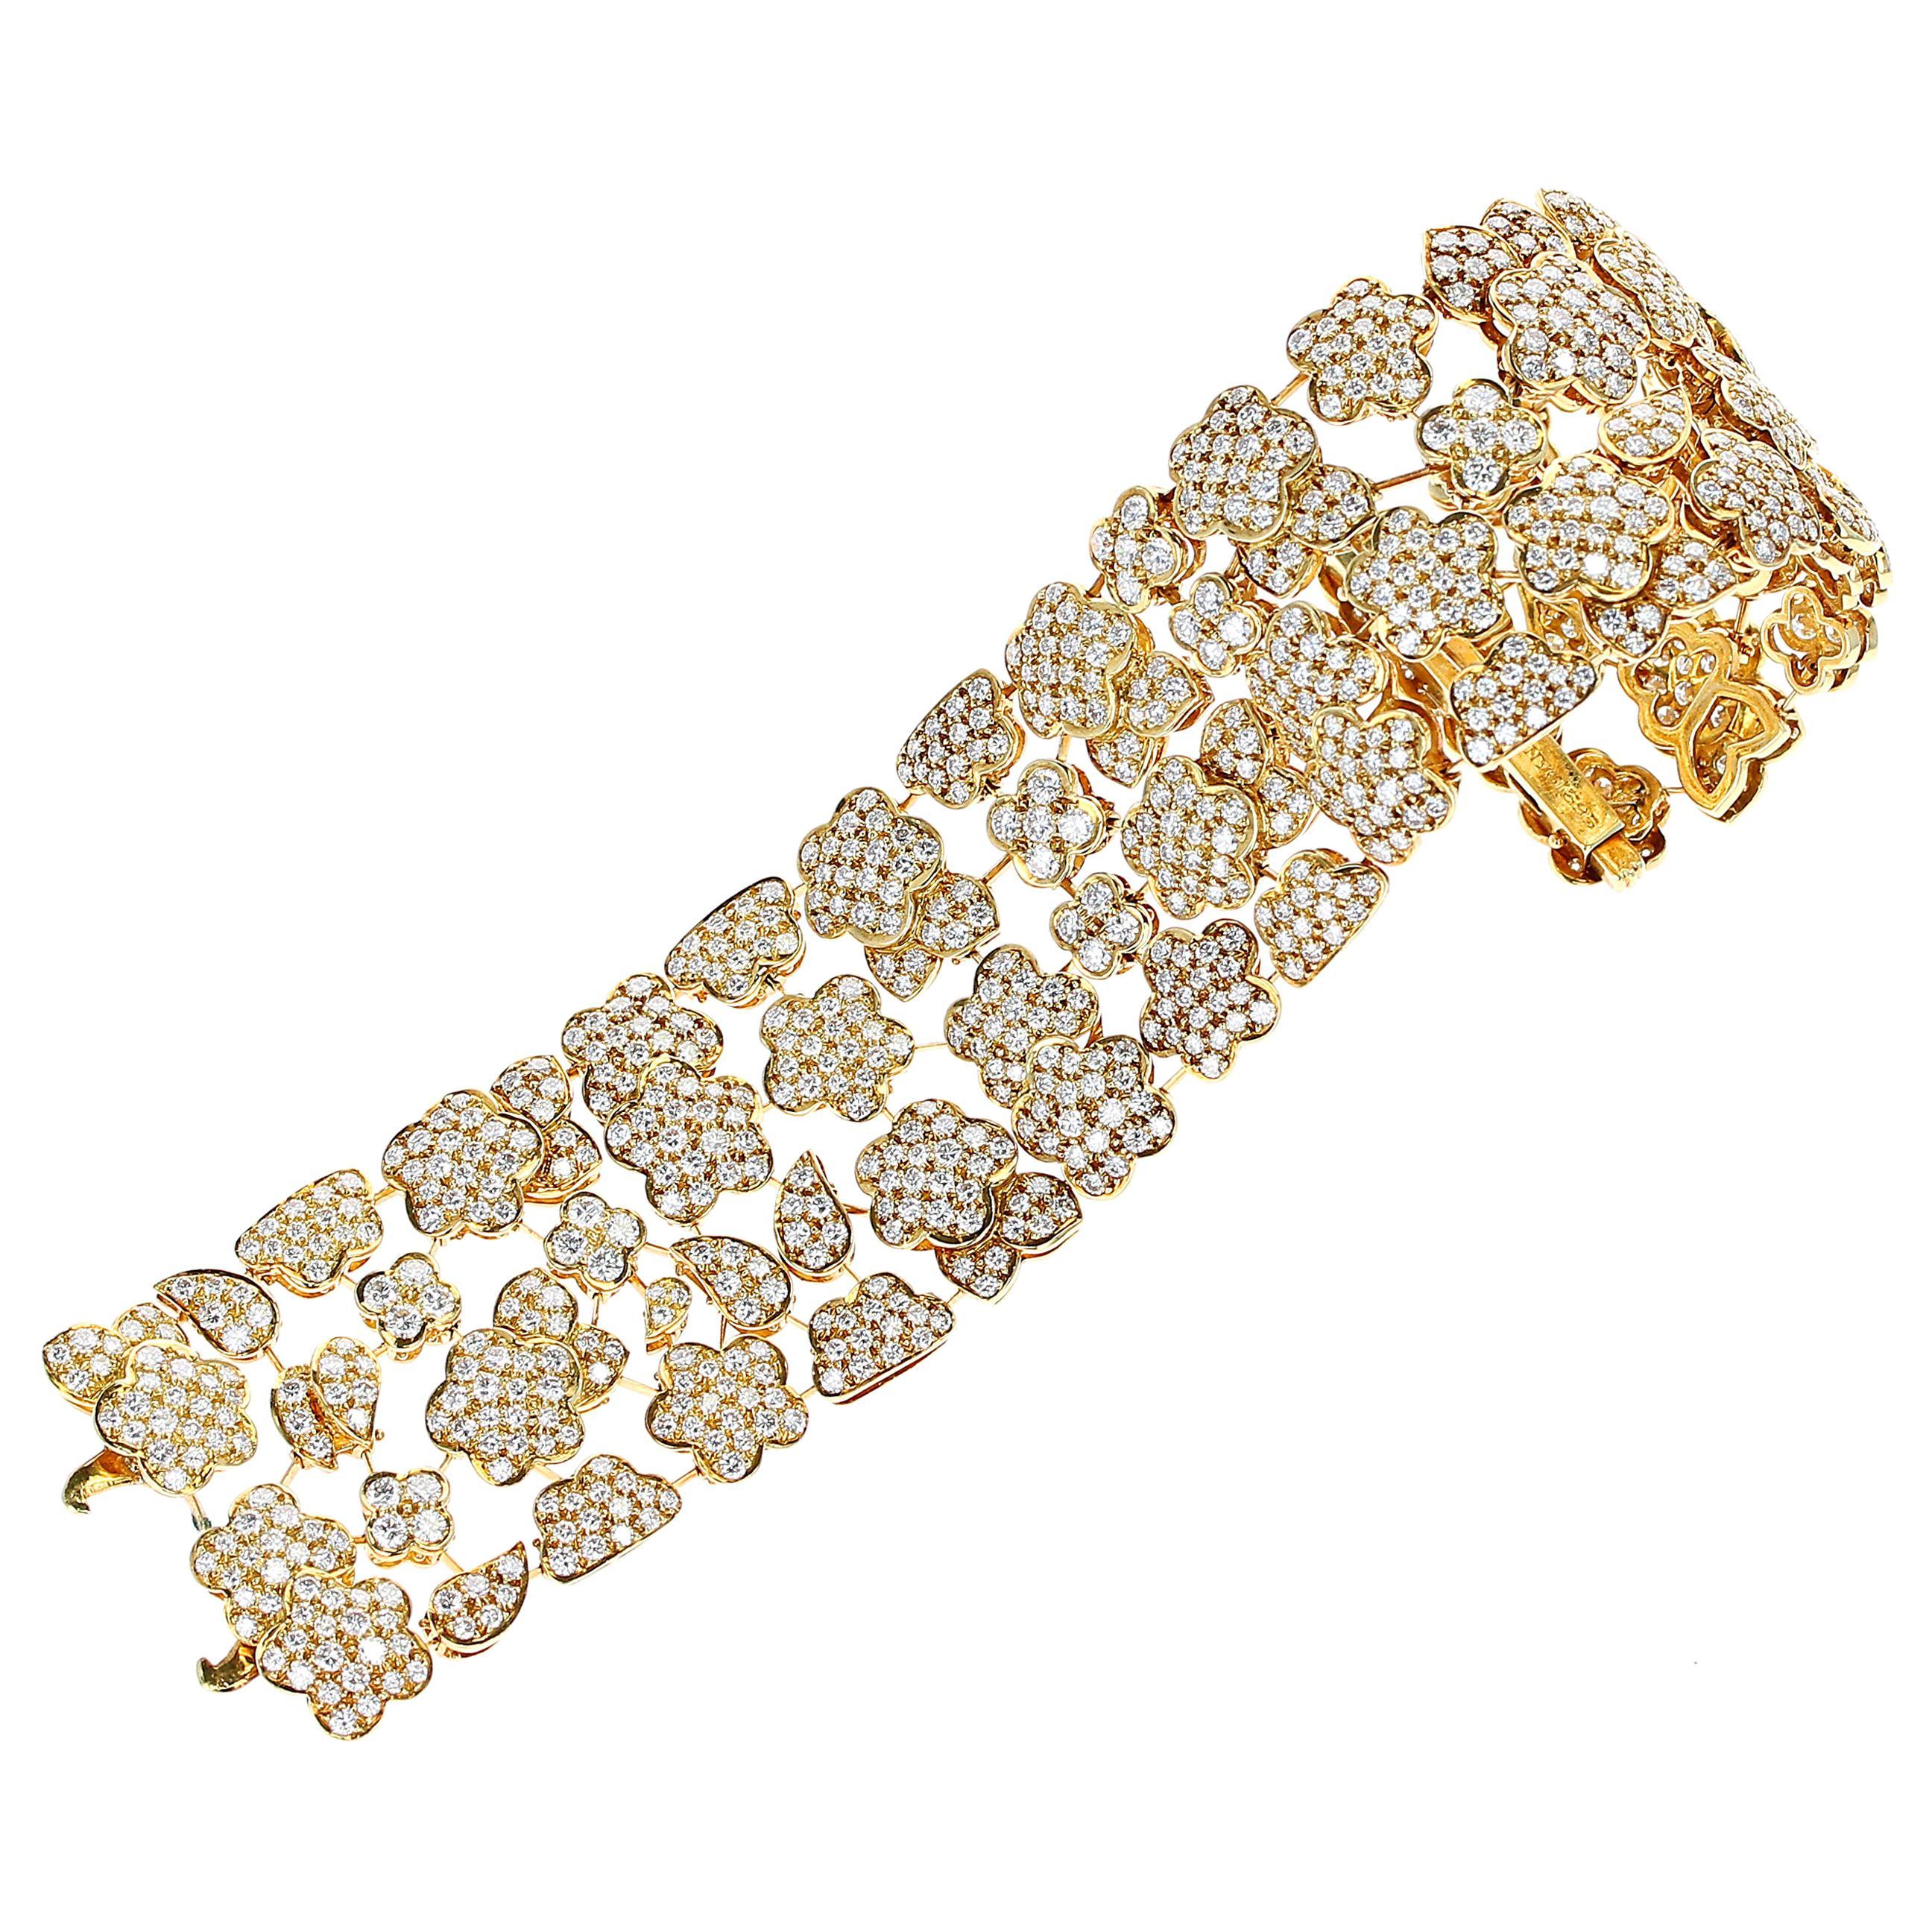 1980s Van Cleef and Arpels Diamond and Gold Bracelet